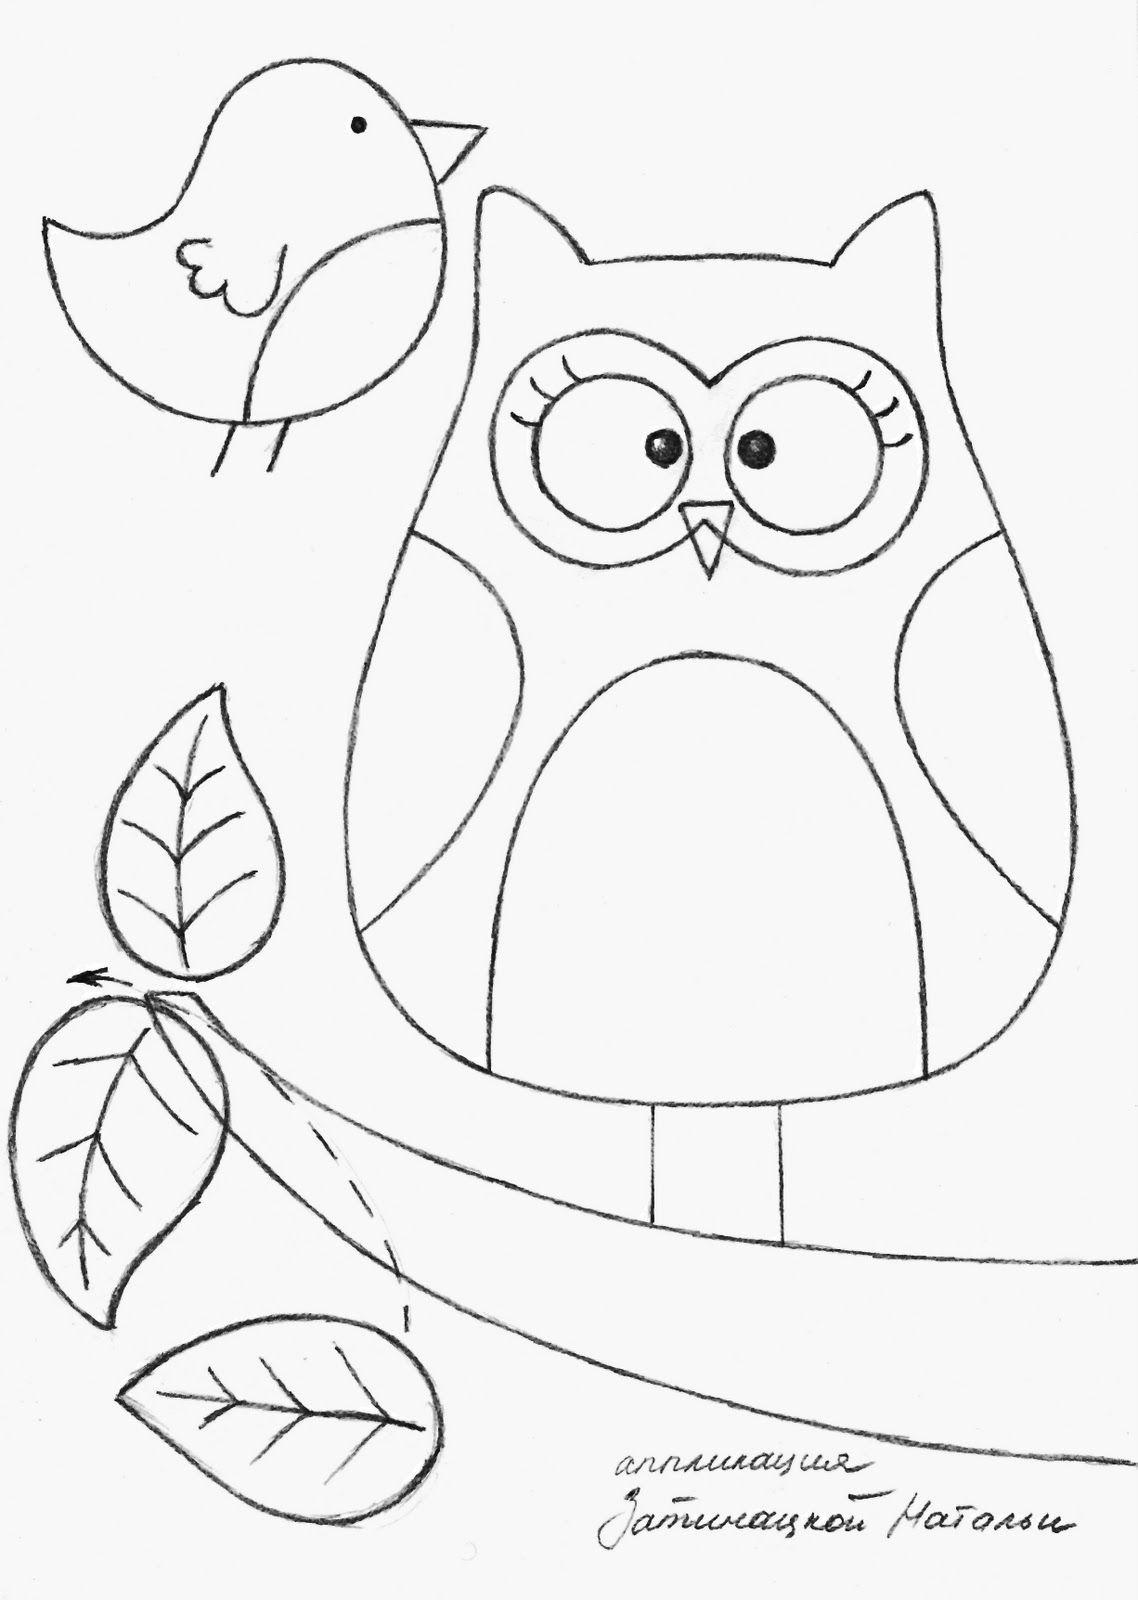 tutorial - cute corujas lindas!!! | Embroidery | Pinterest | Owl ...